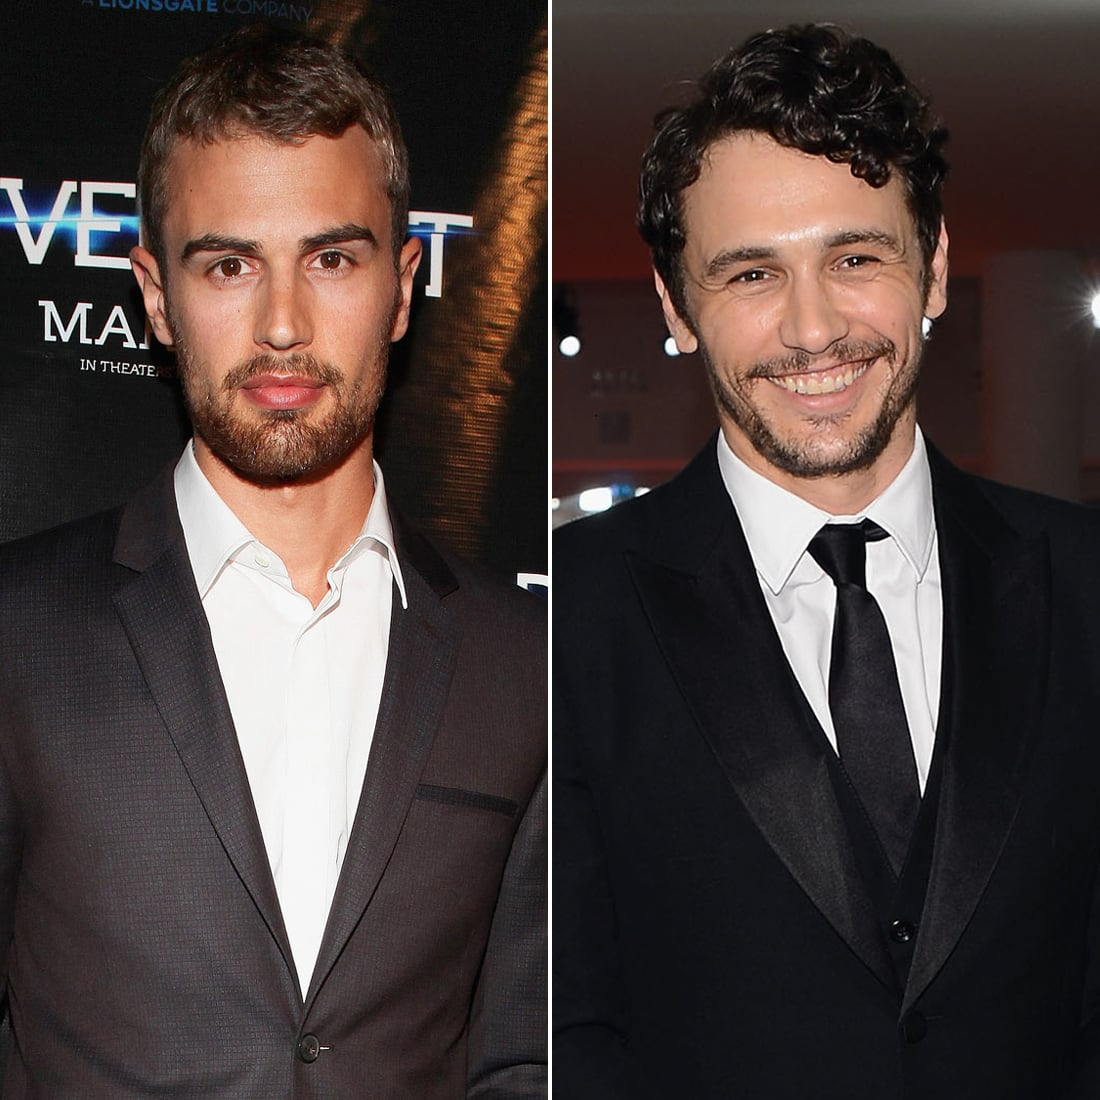 Theo James and James Franco